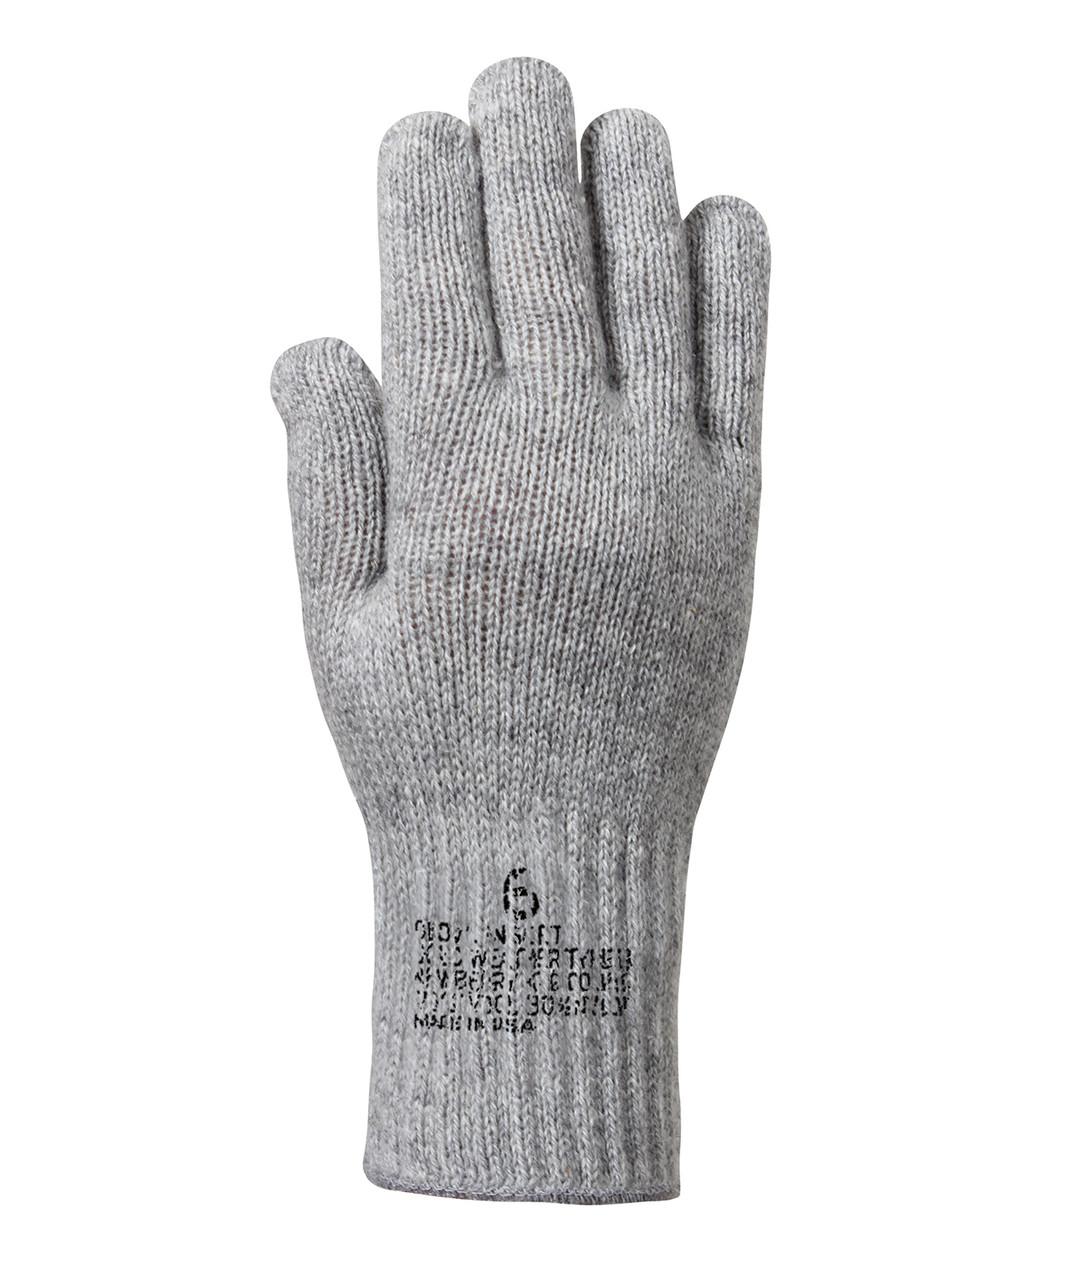 G.I. Wool Glove Liners (Grey)